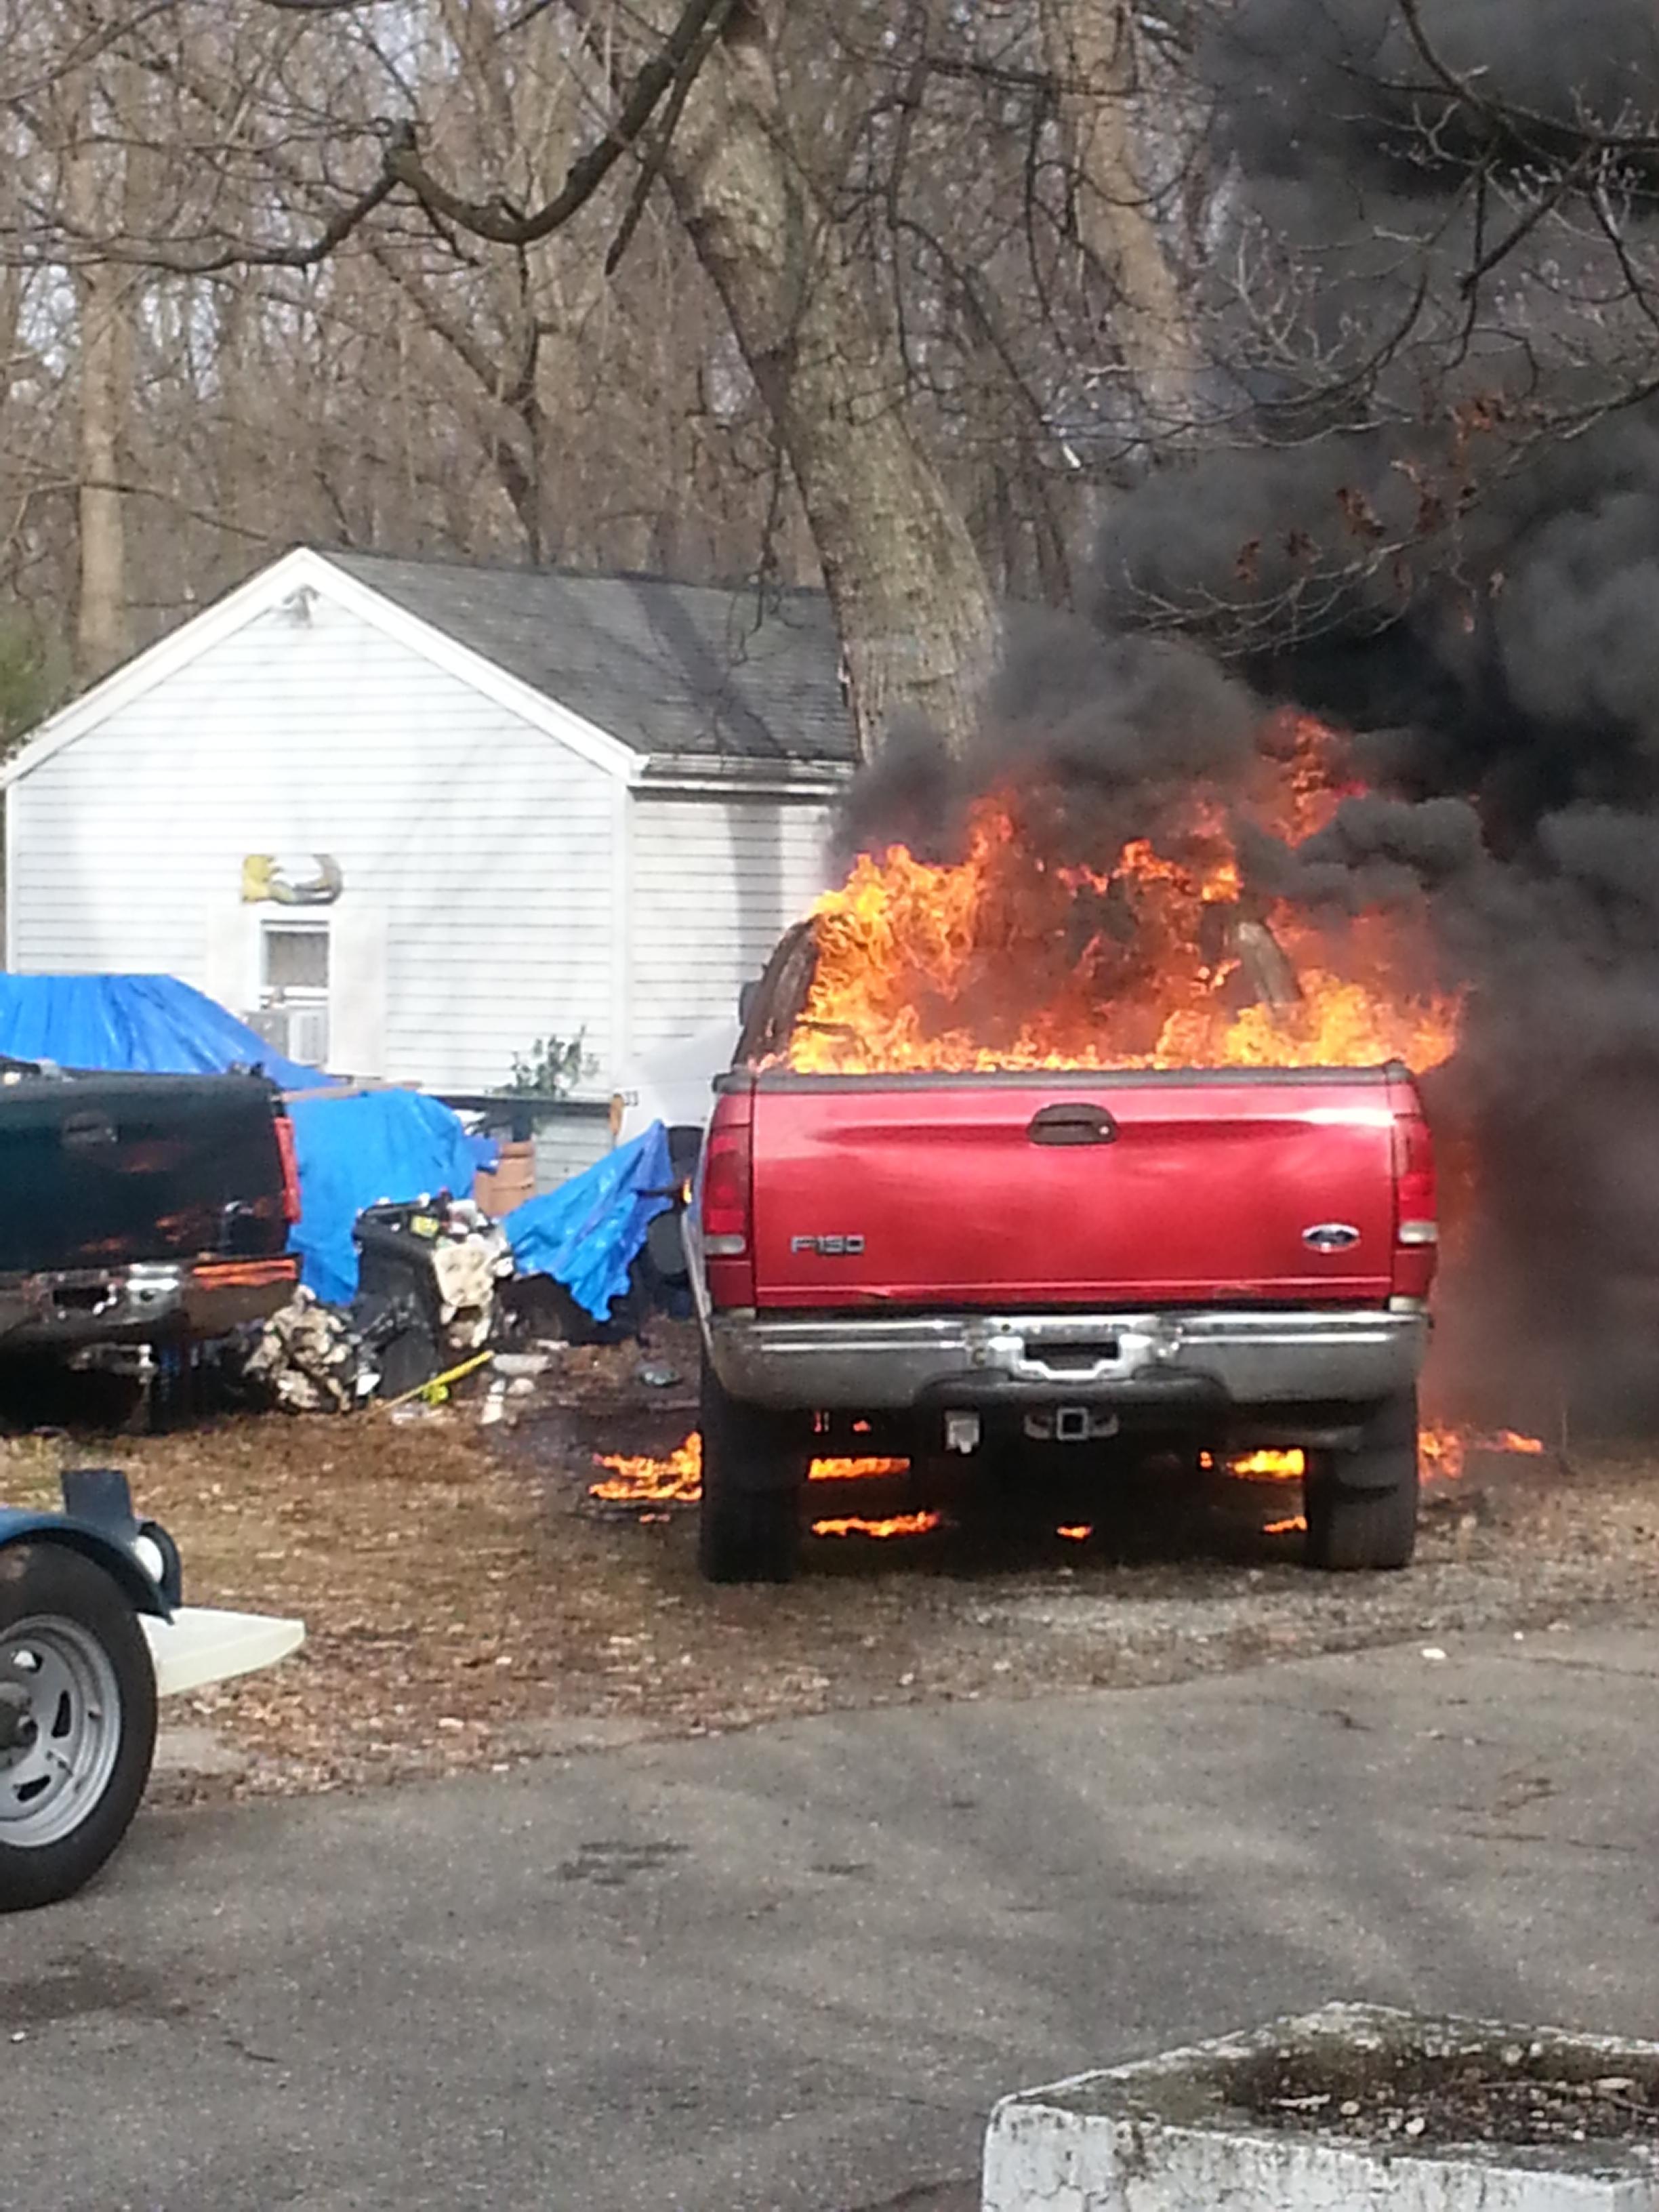 e207a50203f6d3d099ab_Truck_Fire_20_Clinton_Rd__12-11-14_.JPG